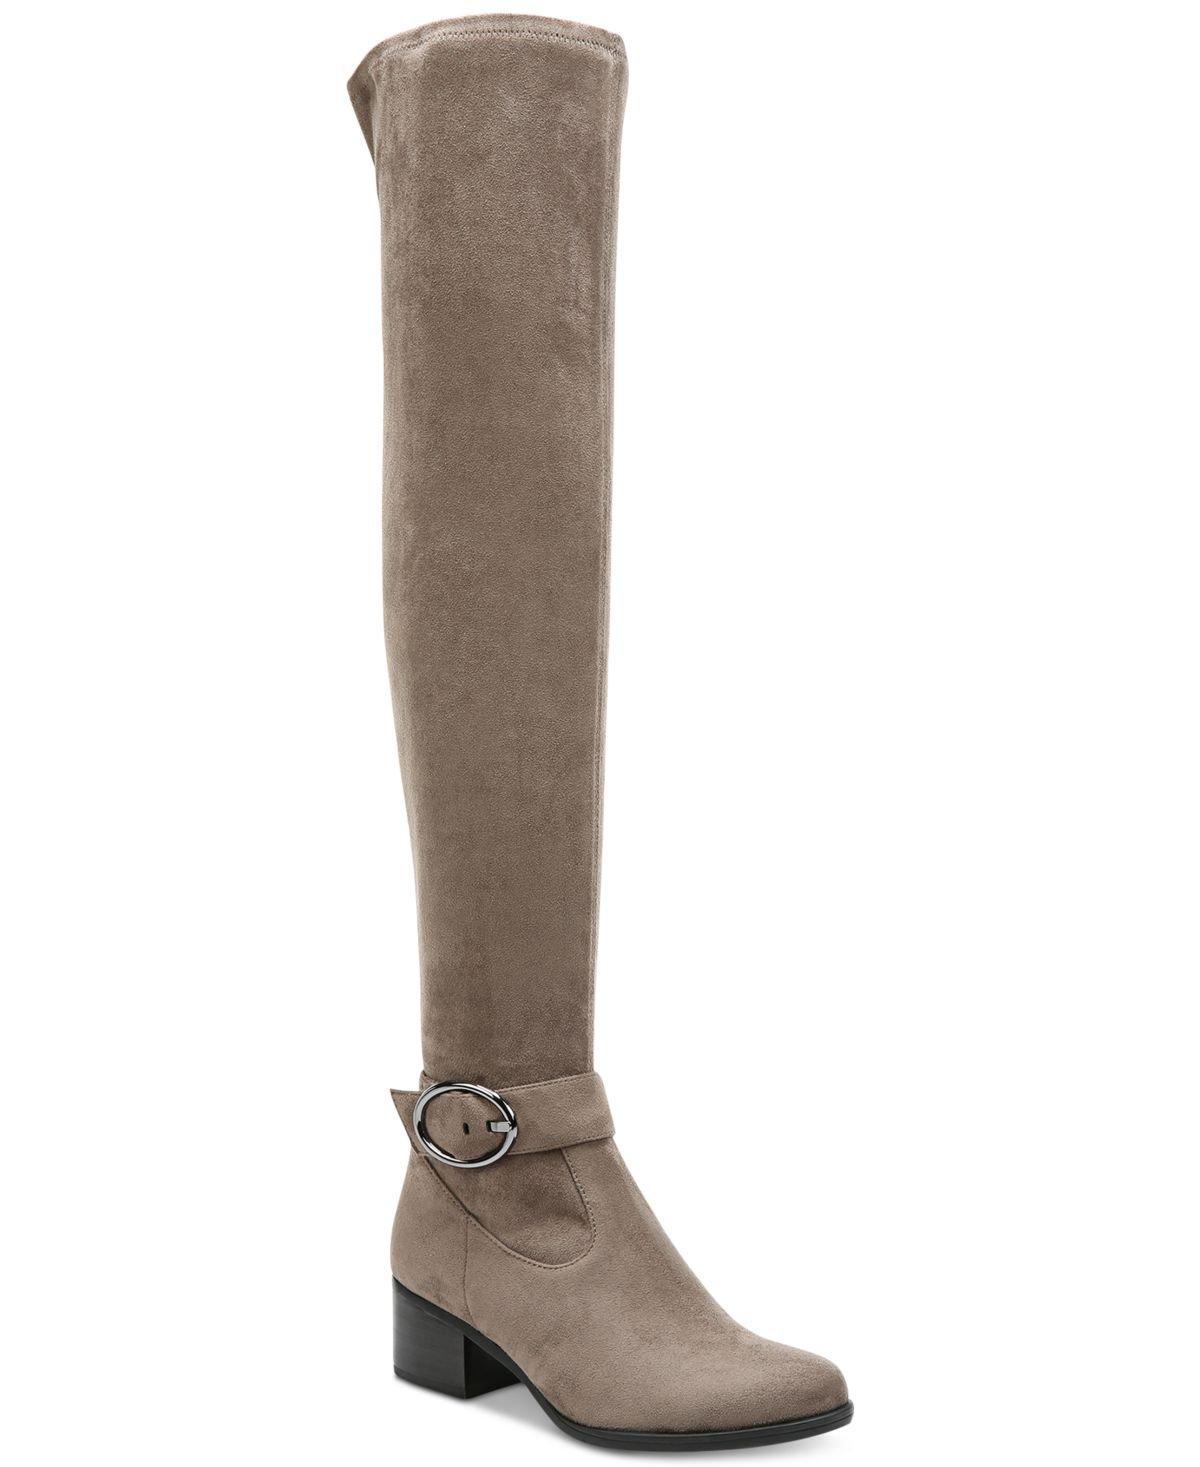 Naturalizer Women's Dayln Slouch Boot B01NANO9YM 8.5 C/D US|Modern Grey Microfiber